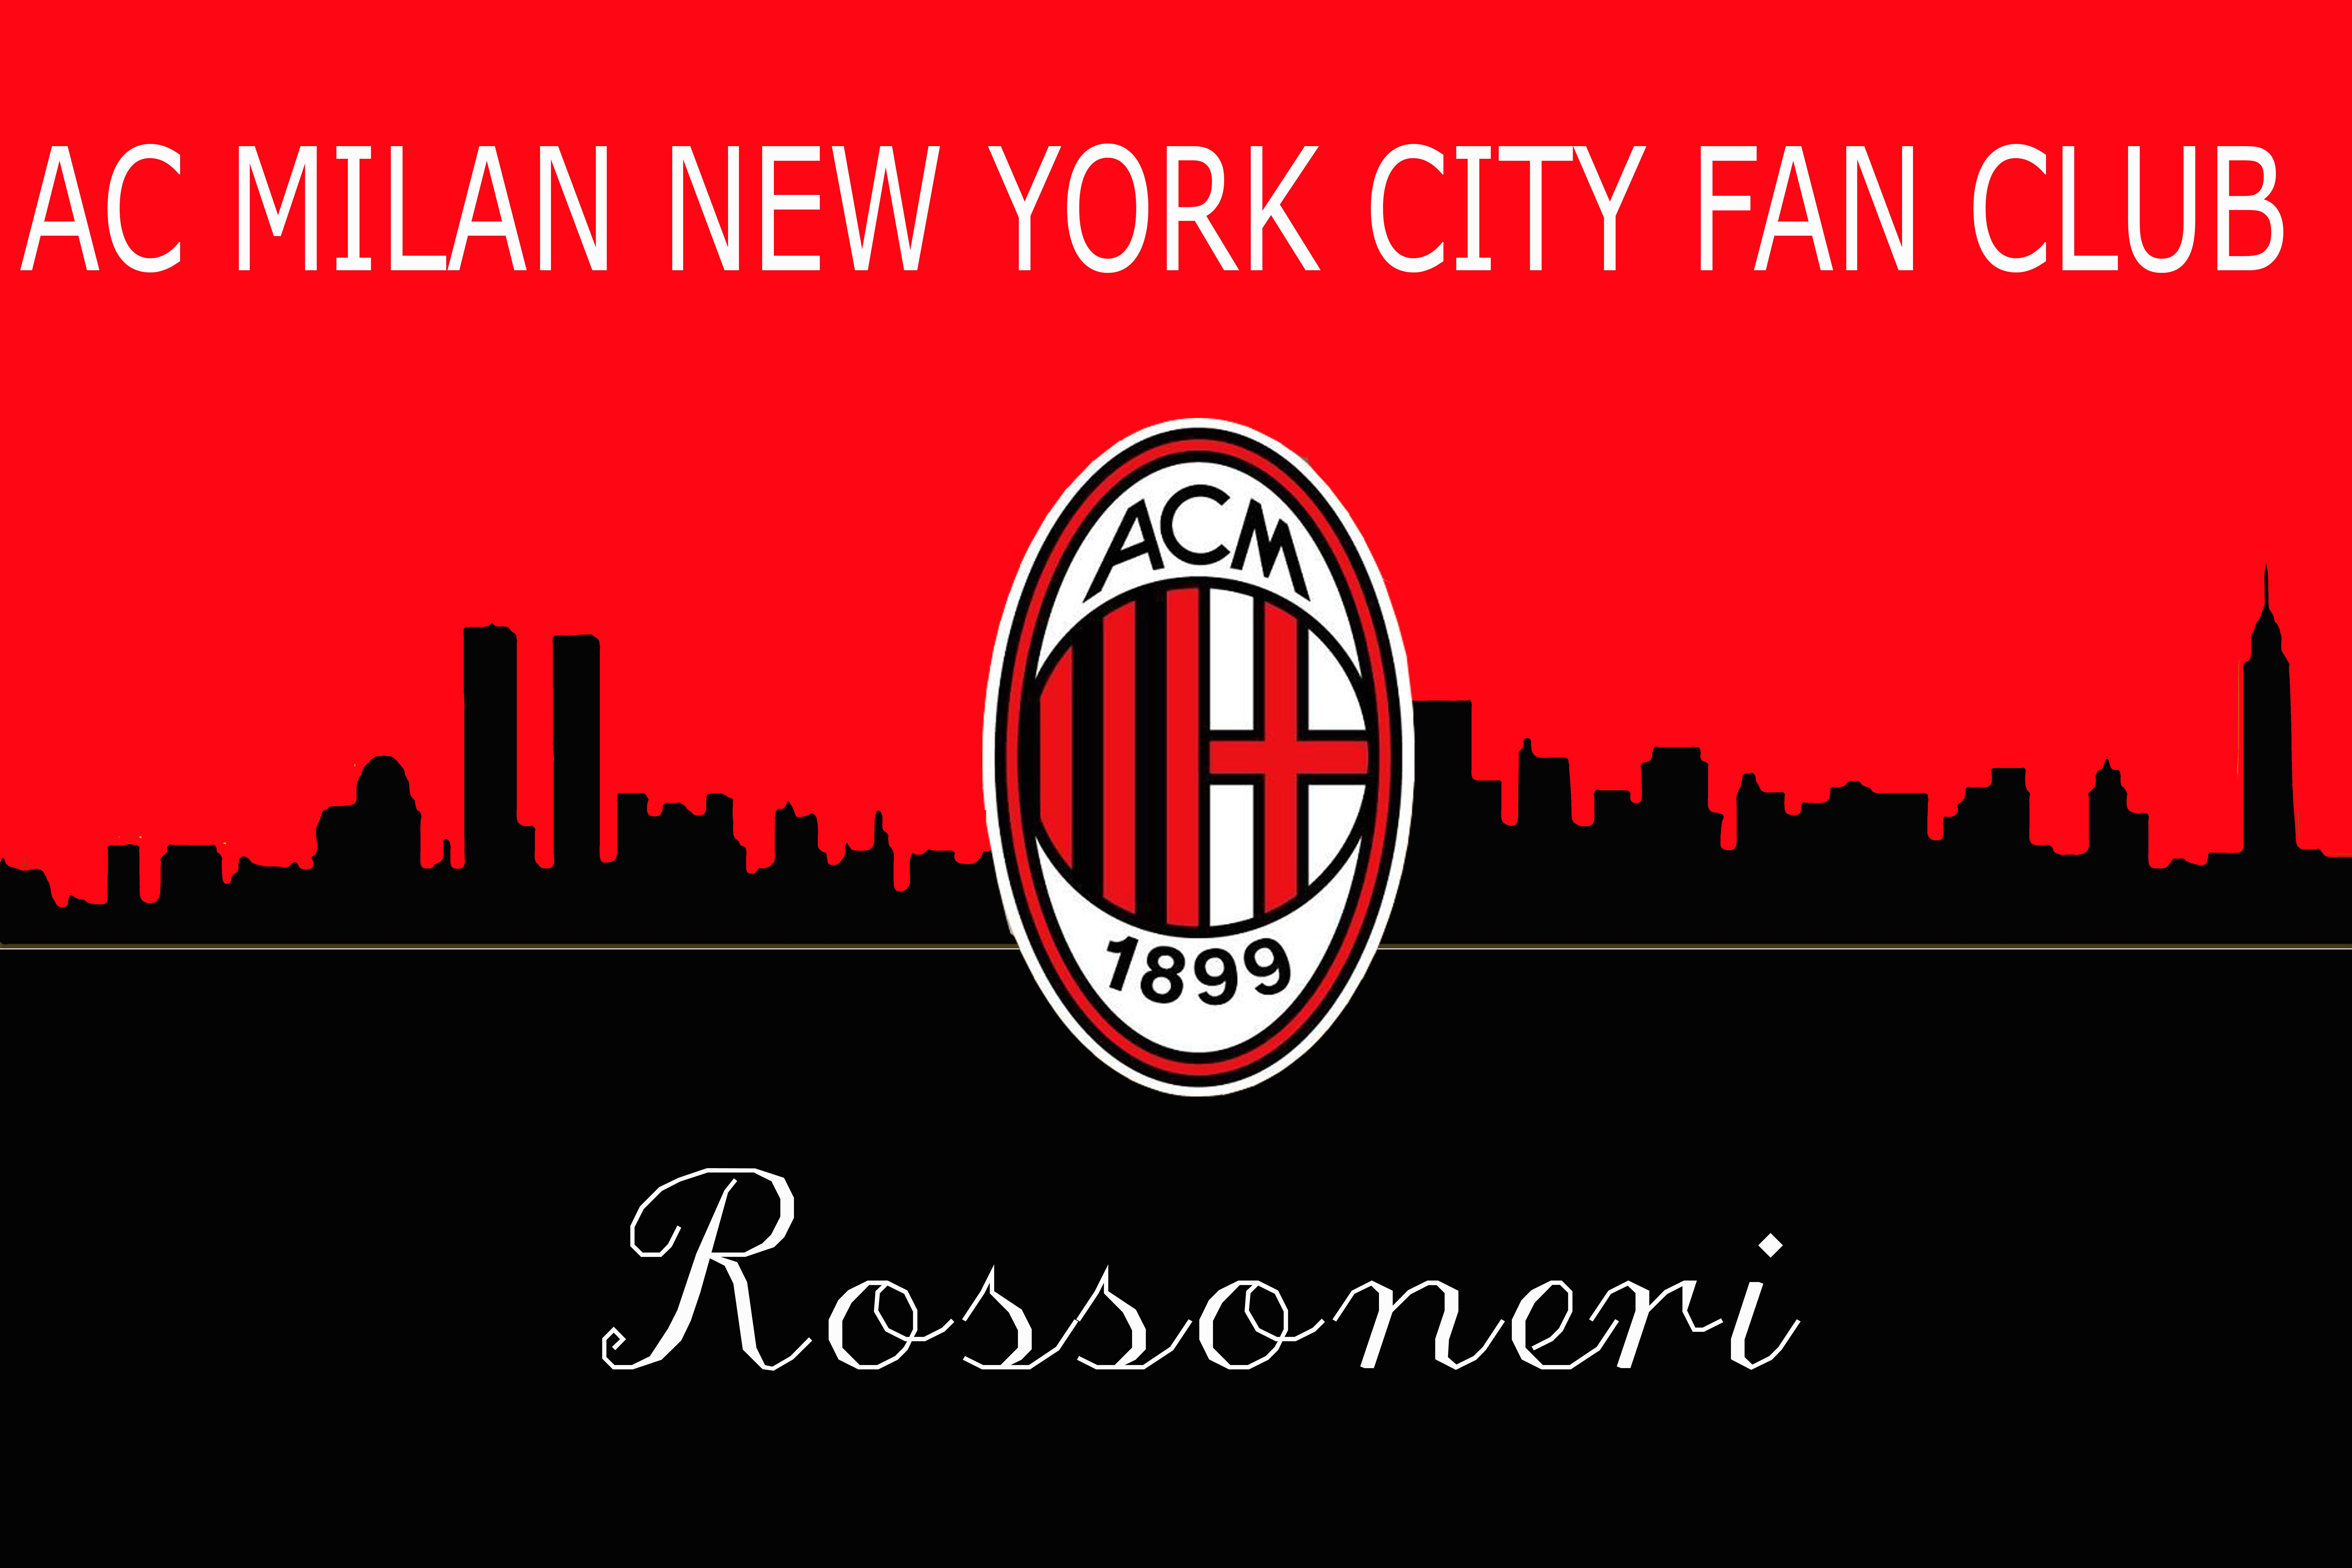 Ac milan fan club new york city for The club milan